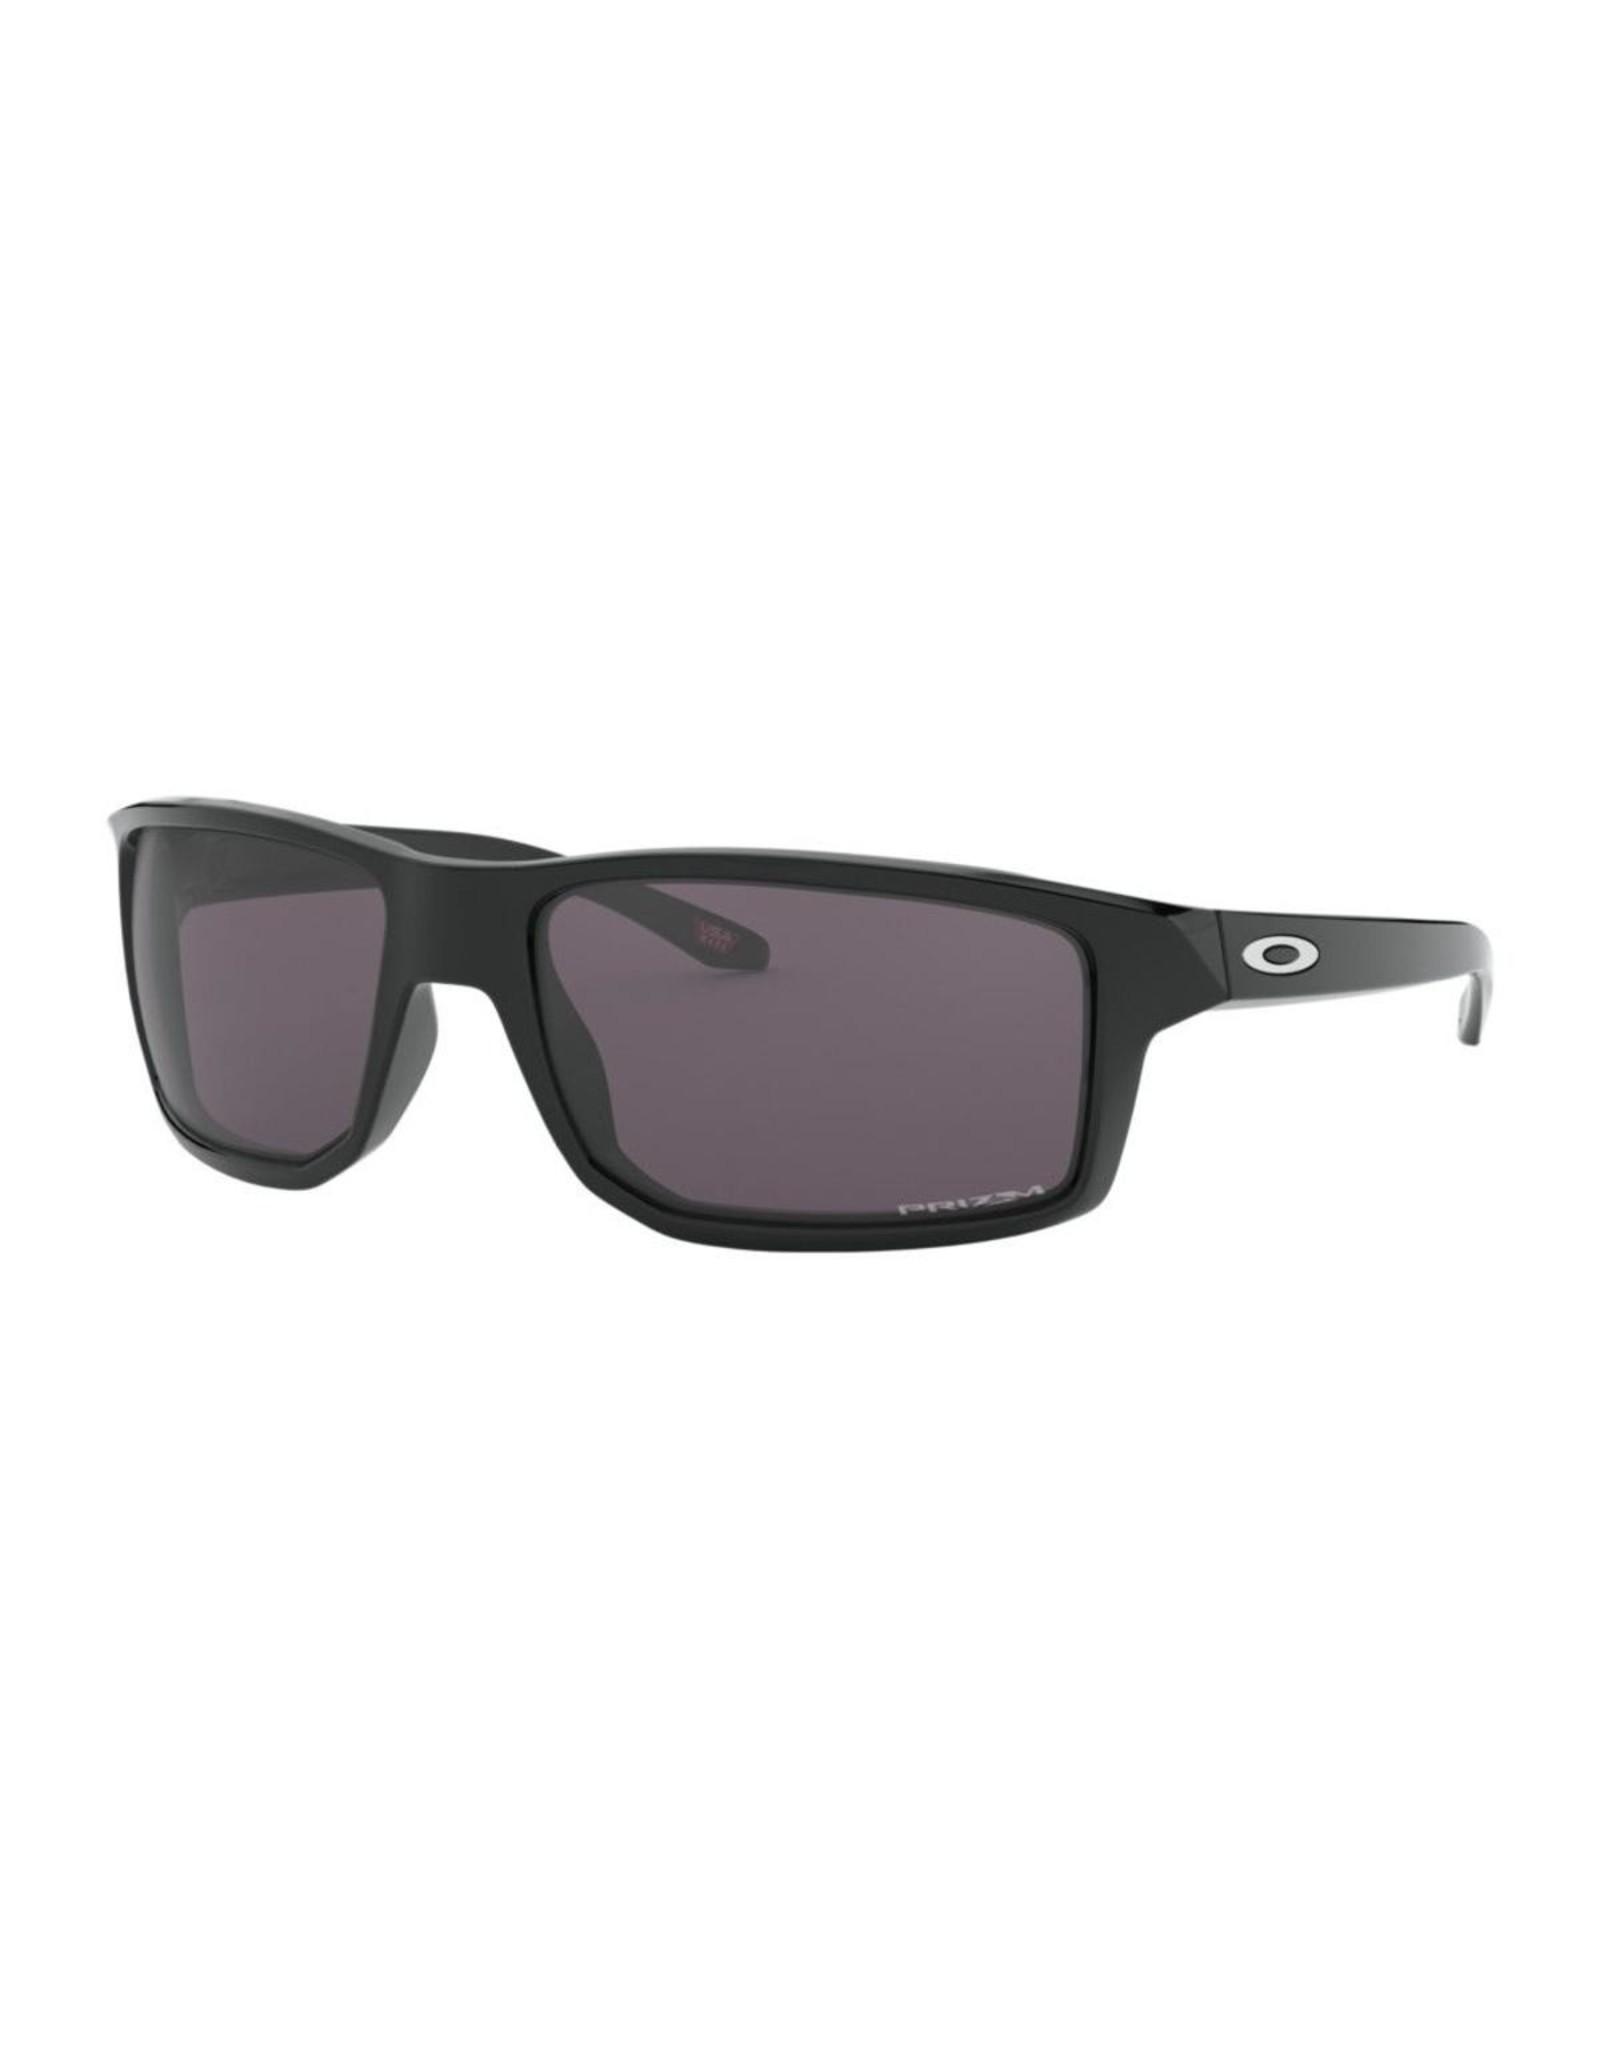 Oakley Mens sunglasses GIBSTON polishes black w/ prizm grey